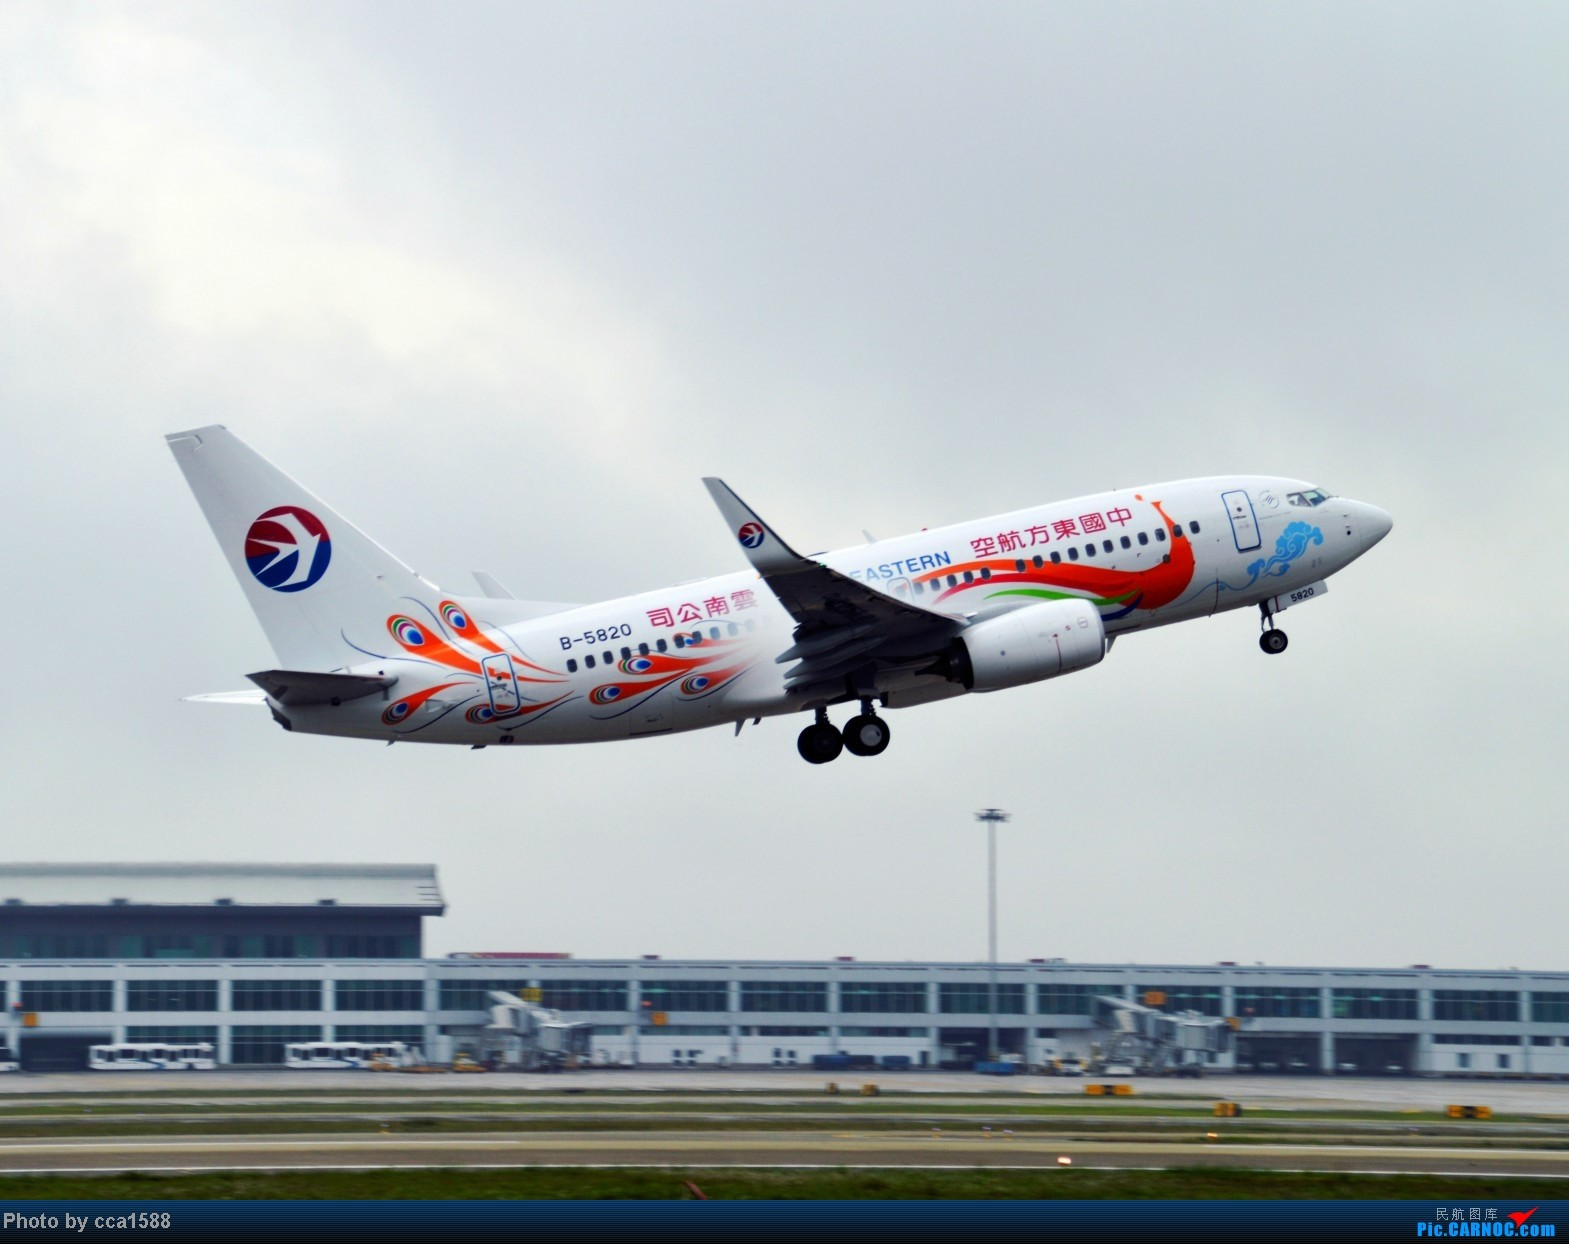 Re:[原创]4.26FOC拍机--烂天出好机,各种奇葩货~~ BOEING 737-700 B-5820 中国福州长乐机场